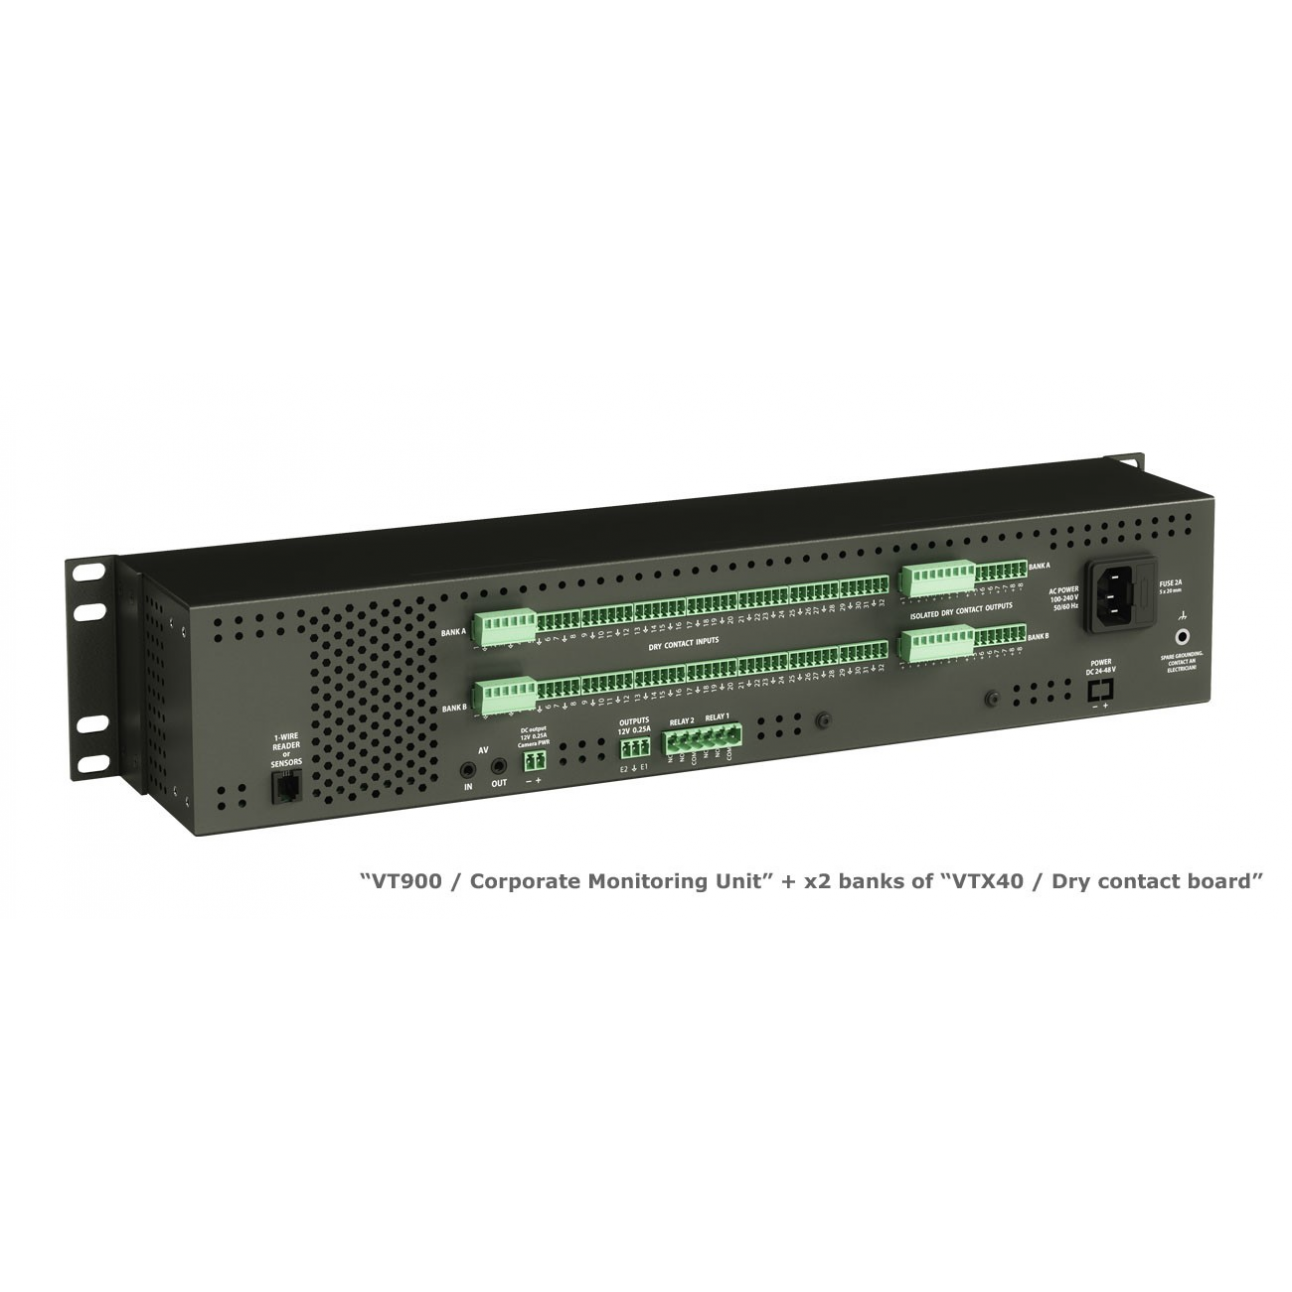 Корпоративный модуль мониторинга VT960